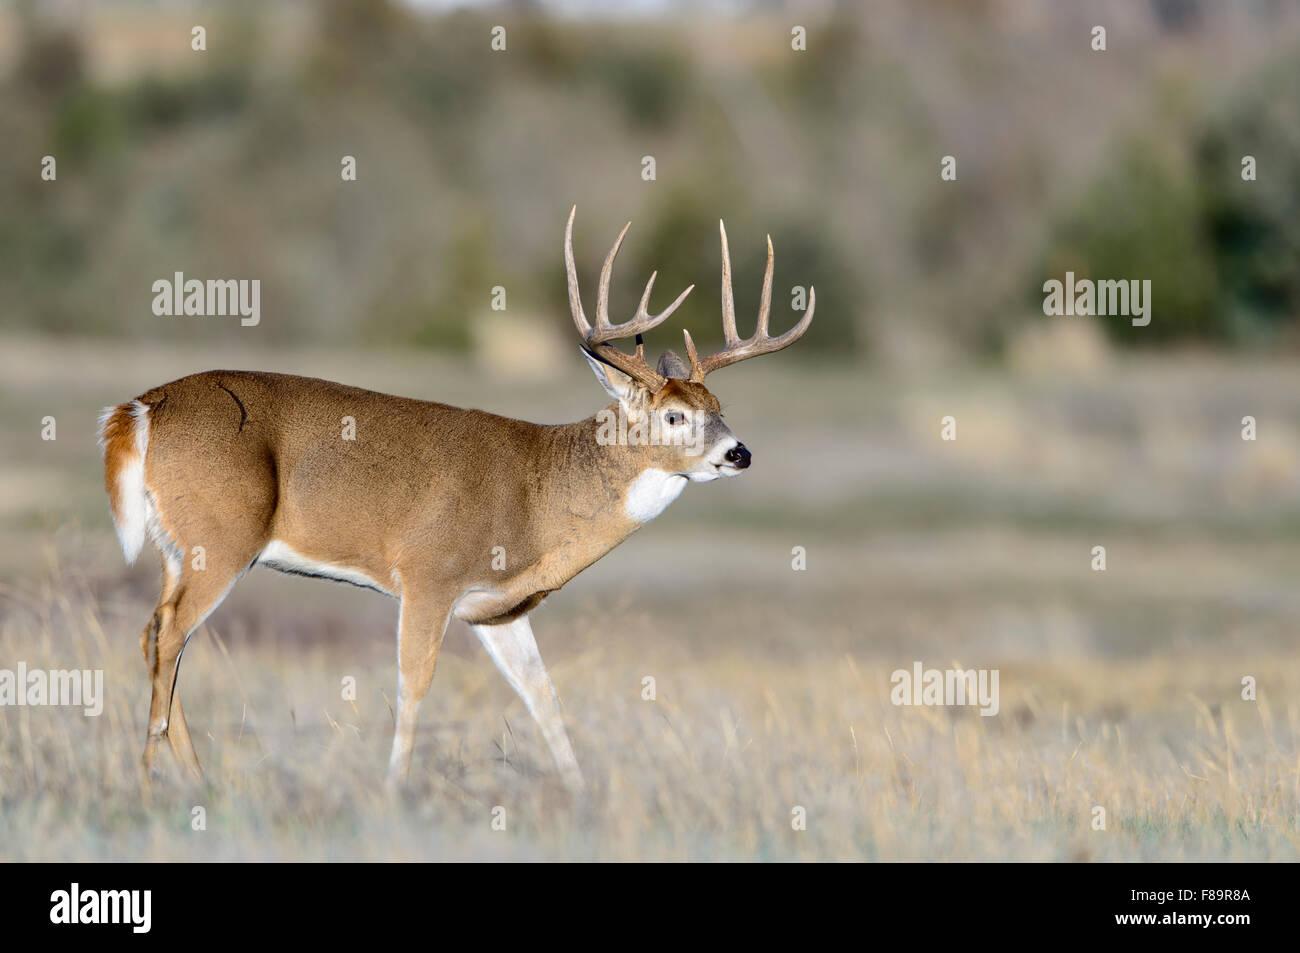 White-tailed Deer Buck, Western US Stock Photo